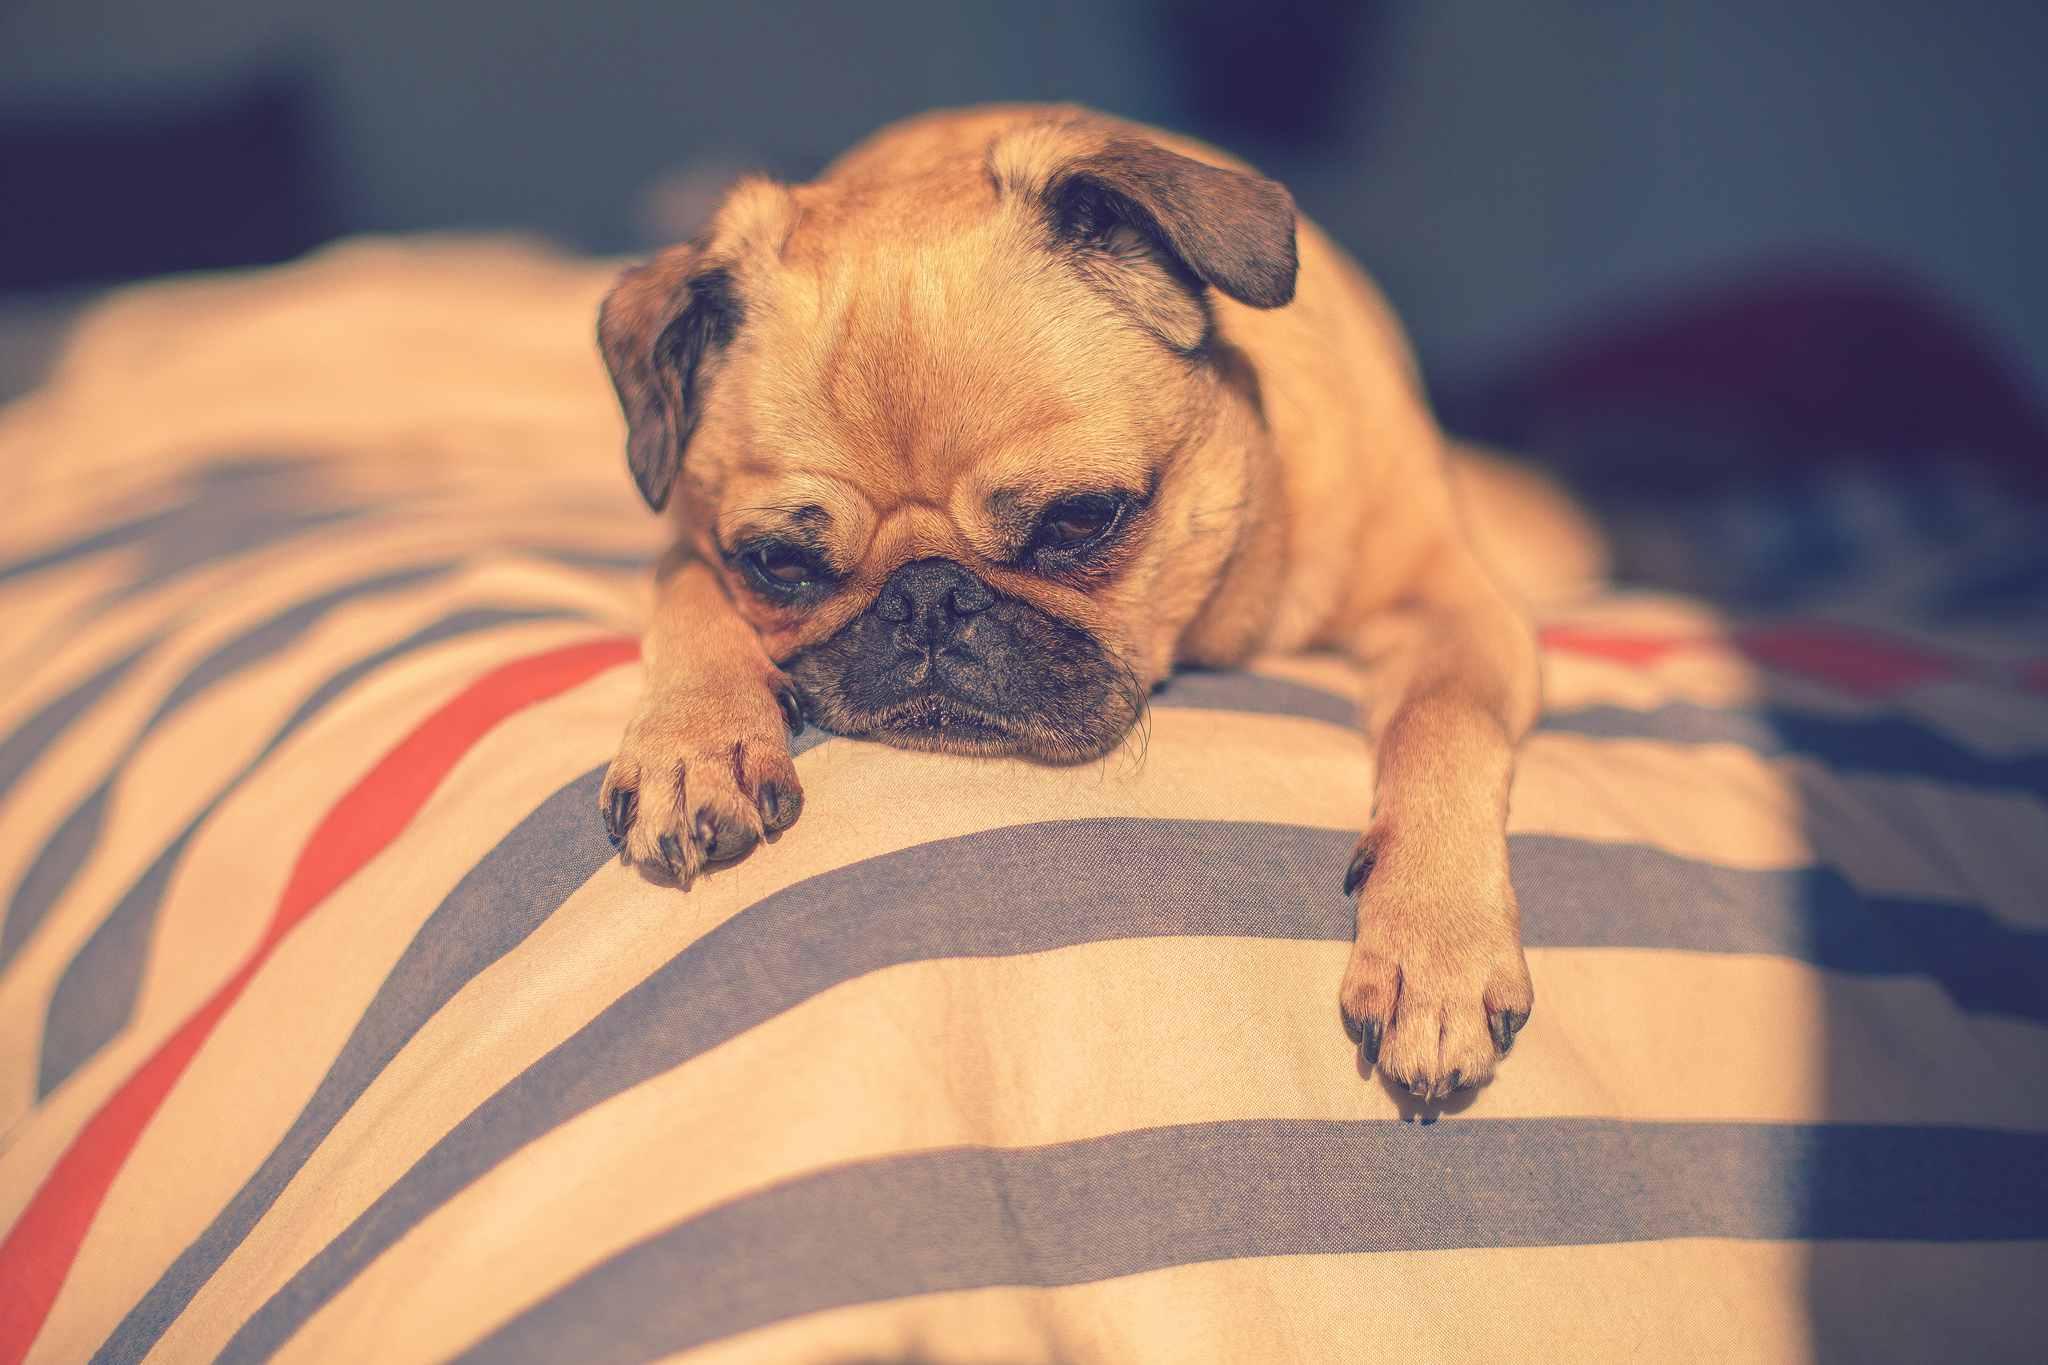 Sleepy small dog on corner of a bed